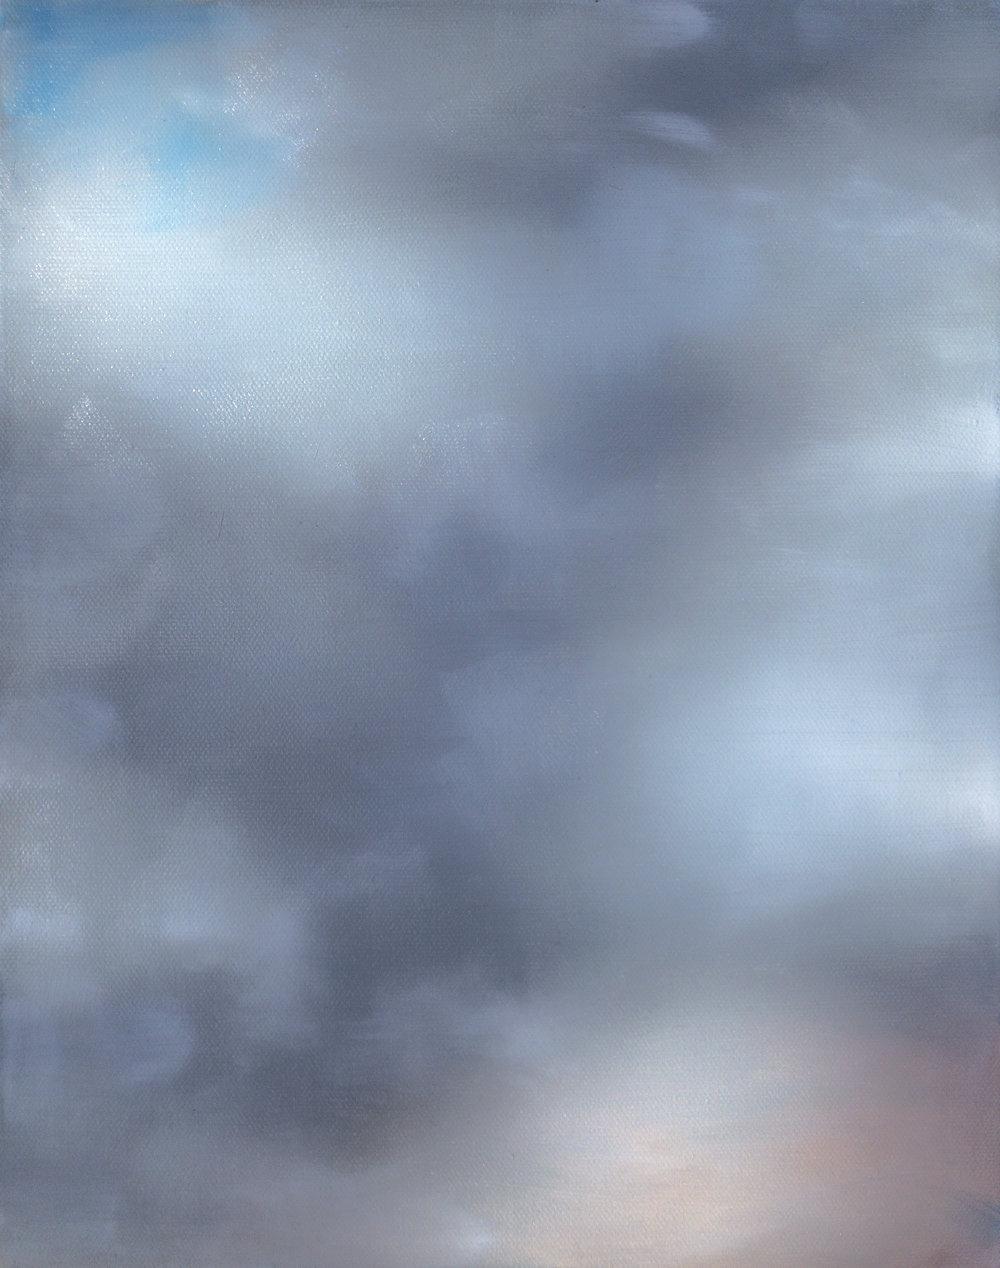 sky self portrait.jpg